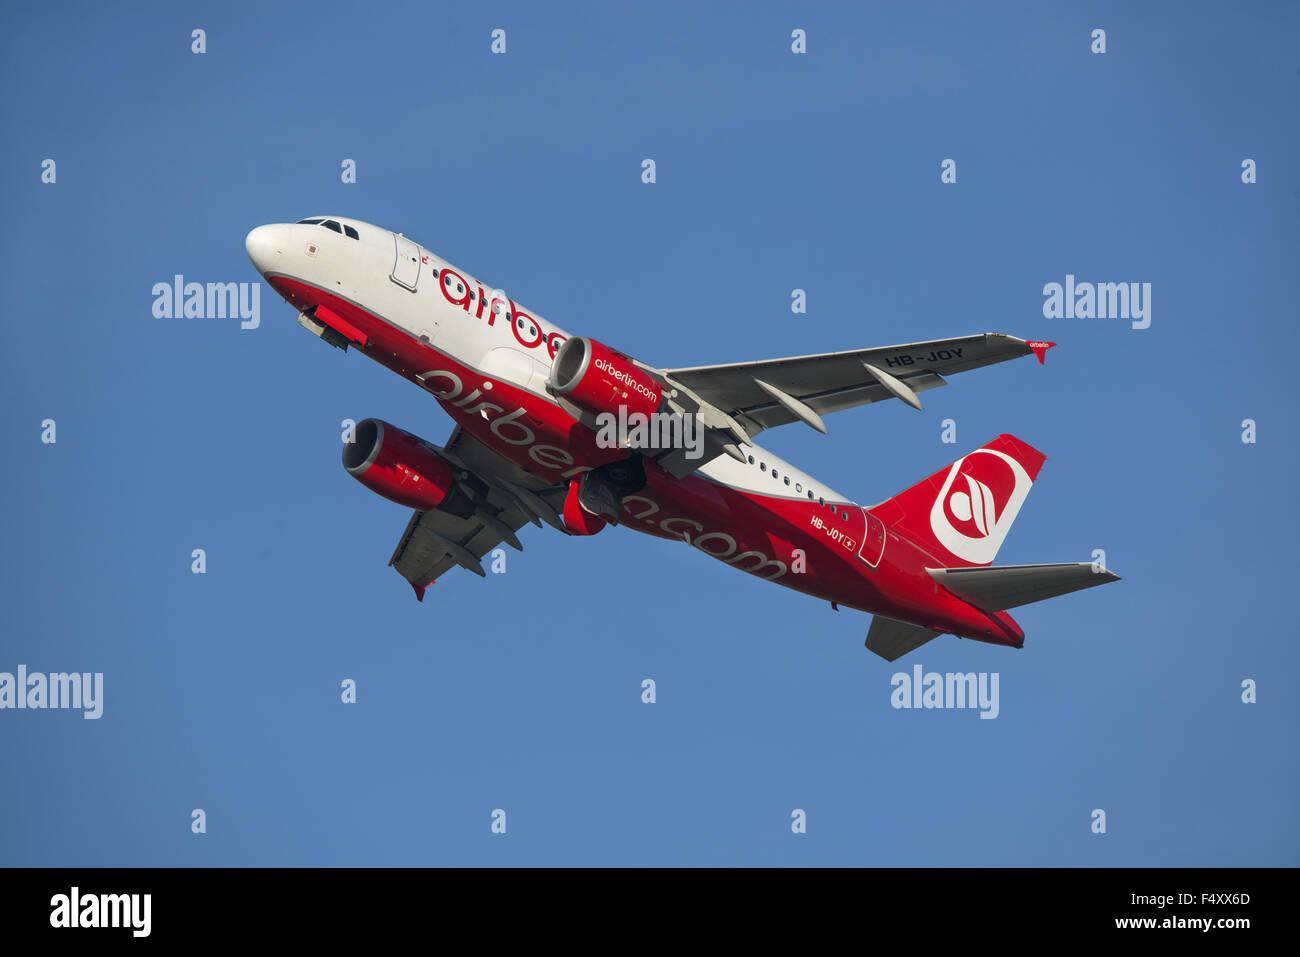 Airbus A319-112, HB-JOY, Airberlin, climbing - Stock Image